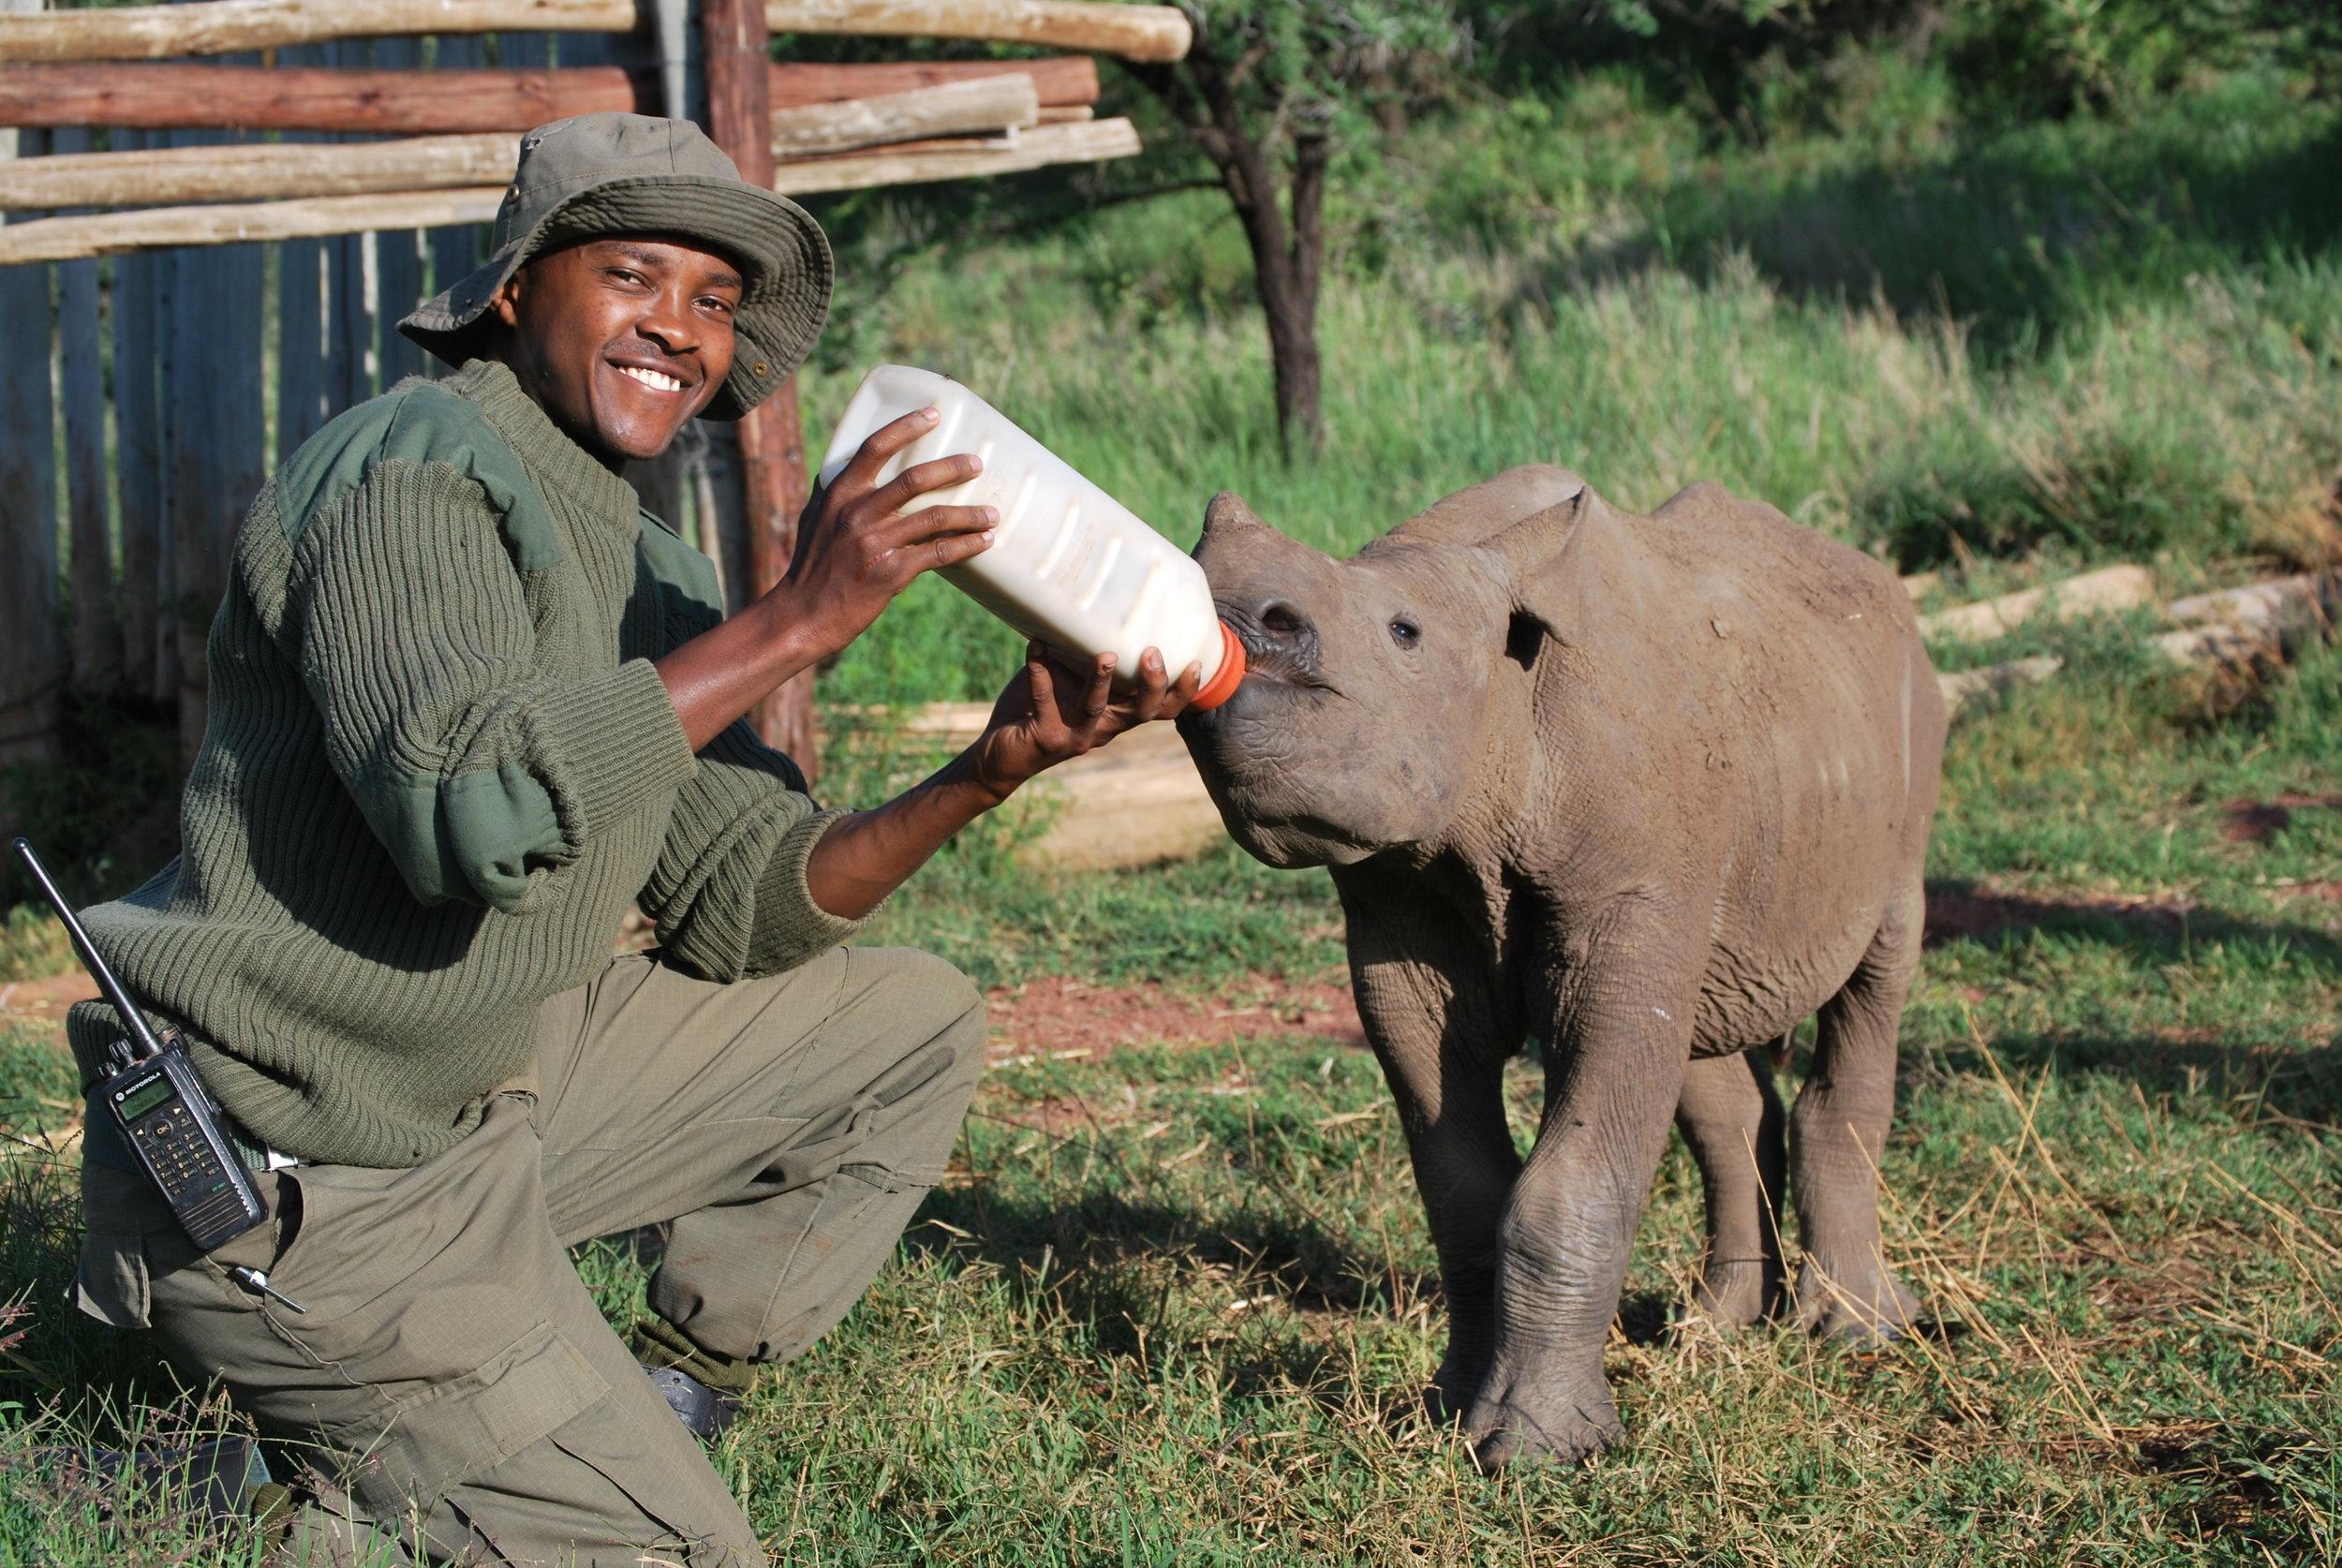 tofauti Osman with baby elephant